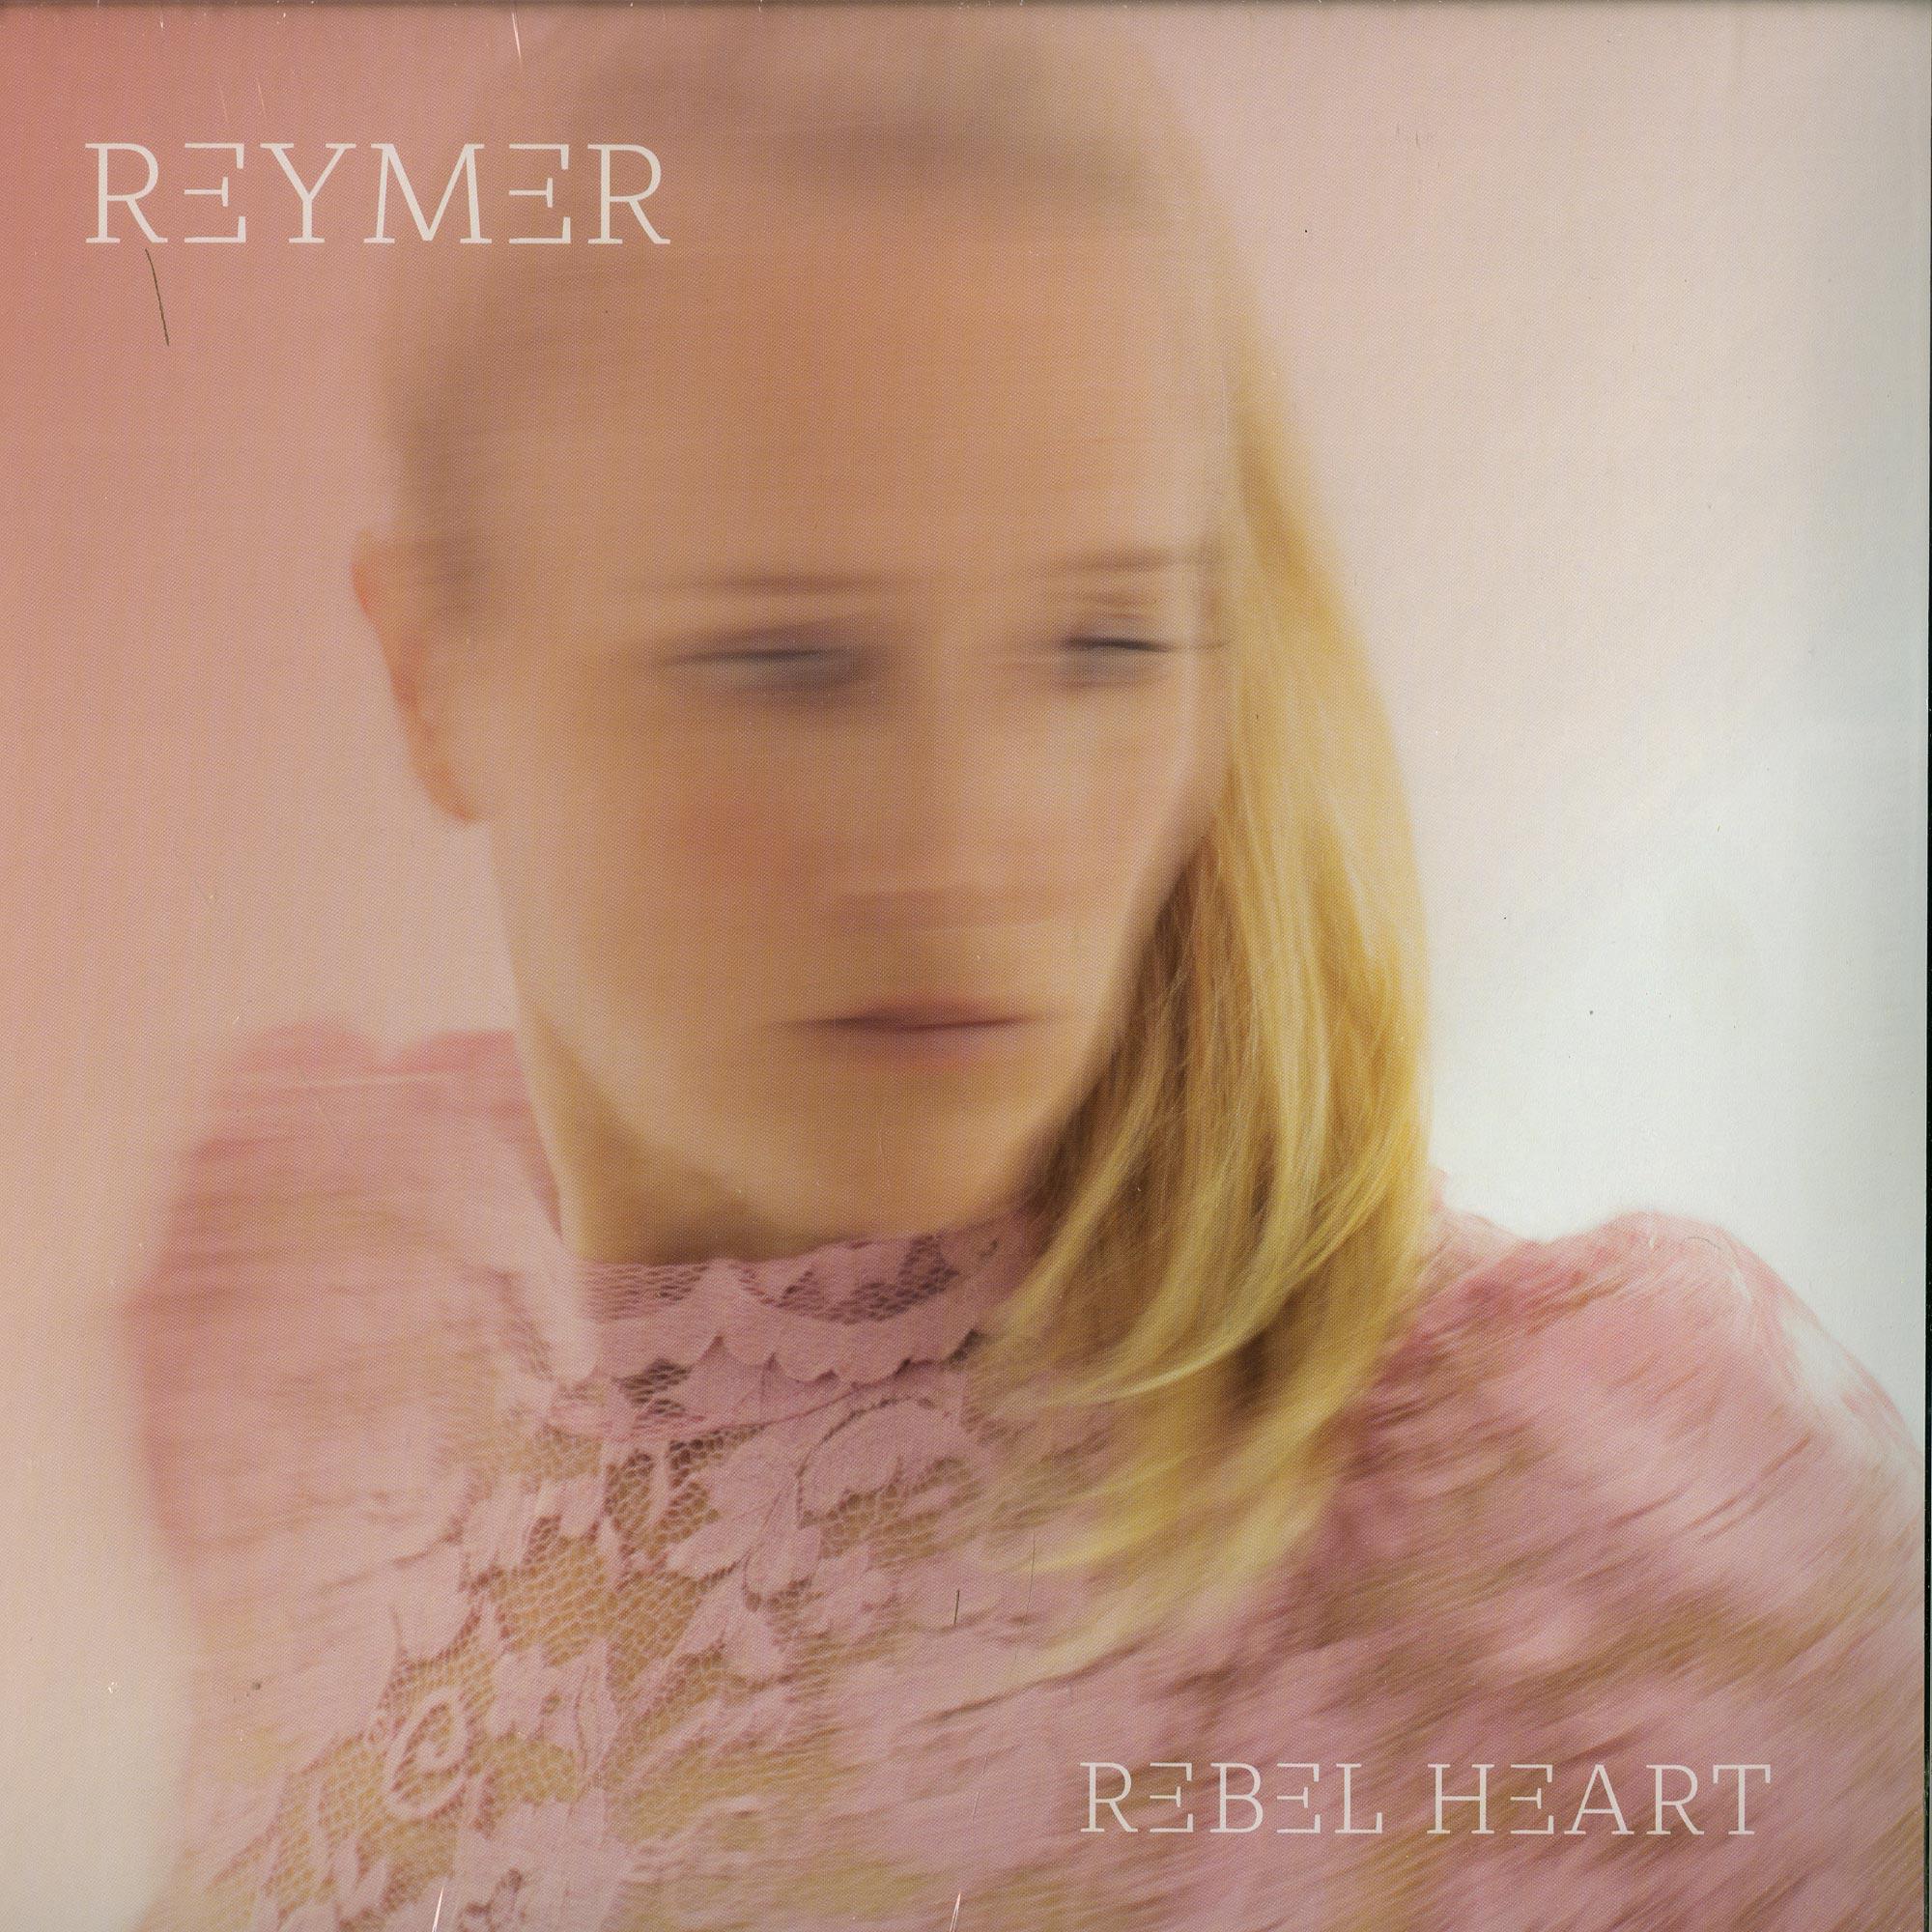 Reymer - REBEL HEART